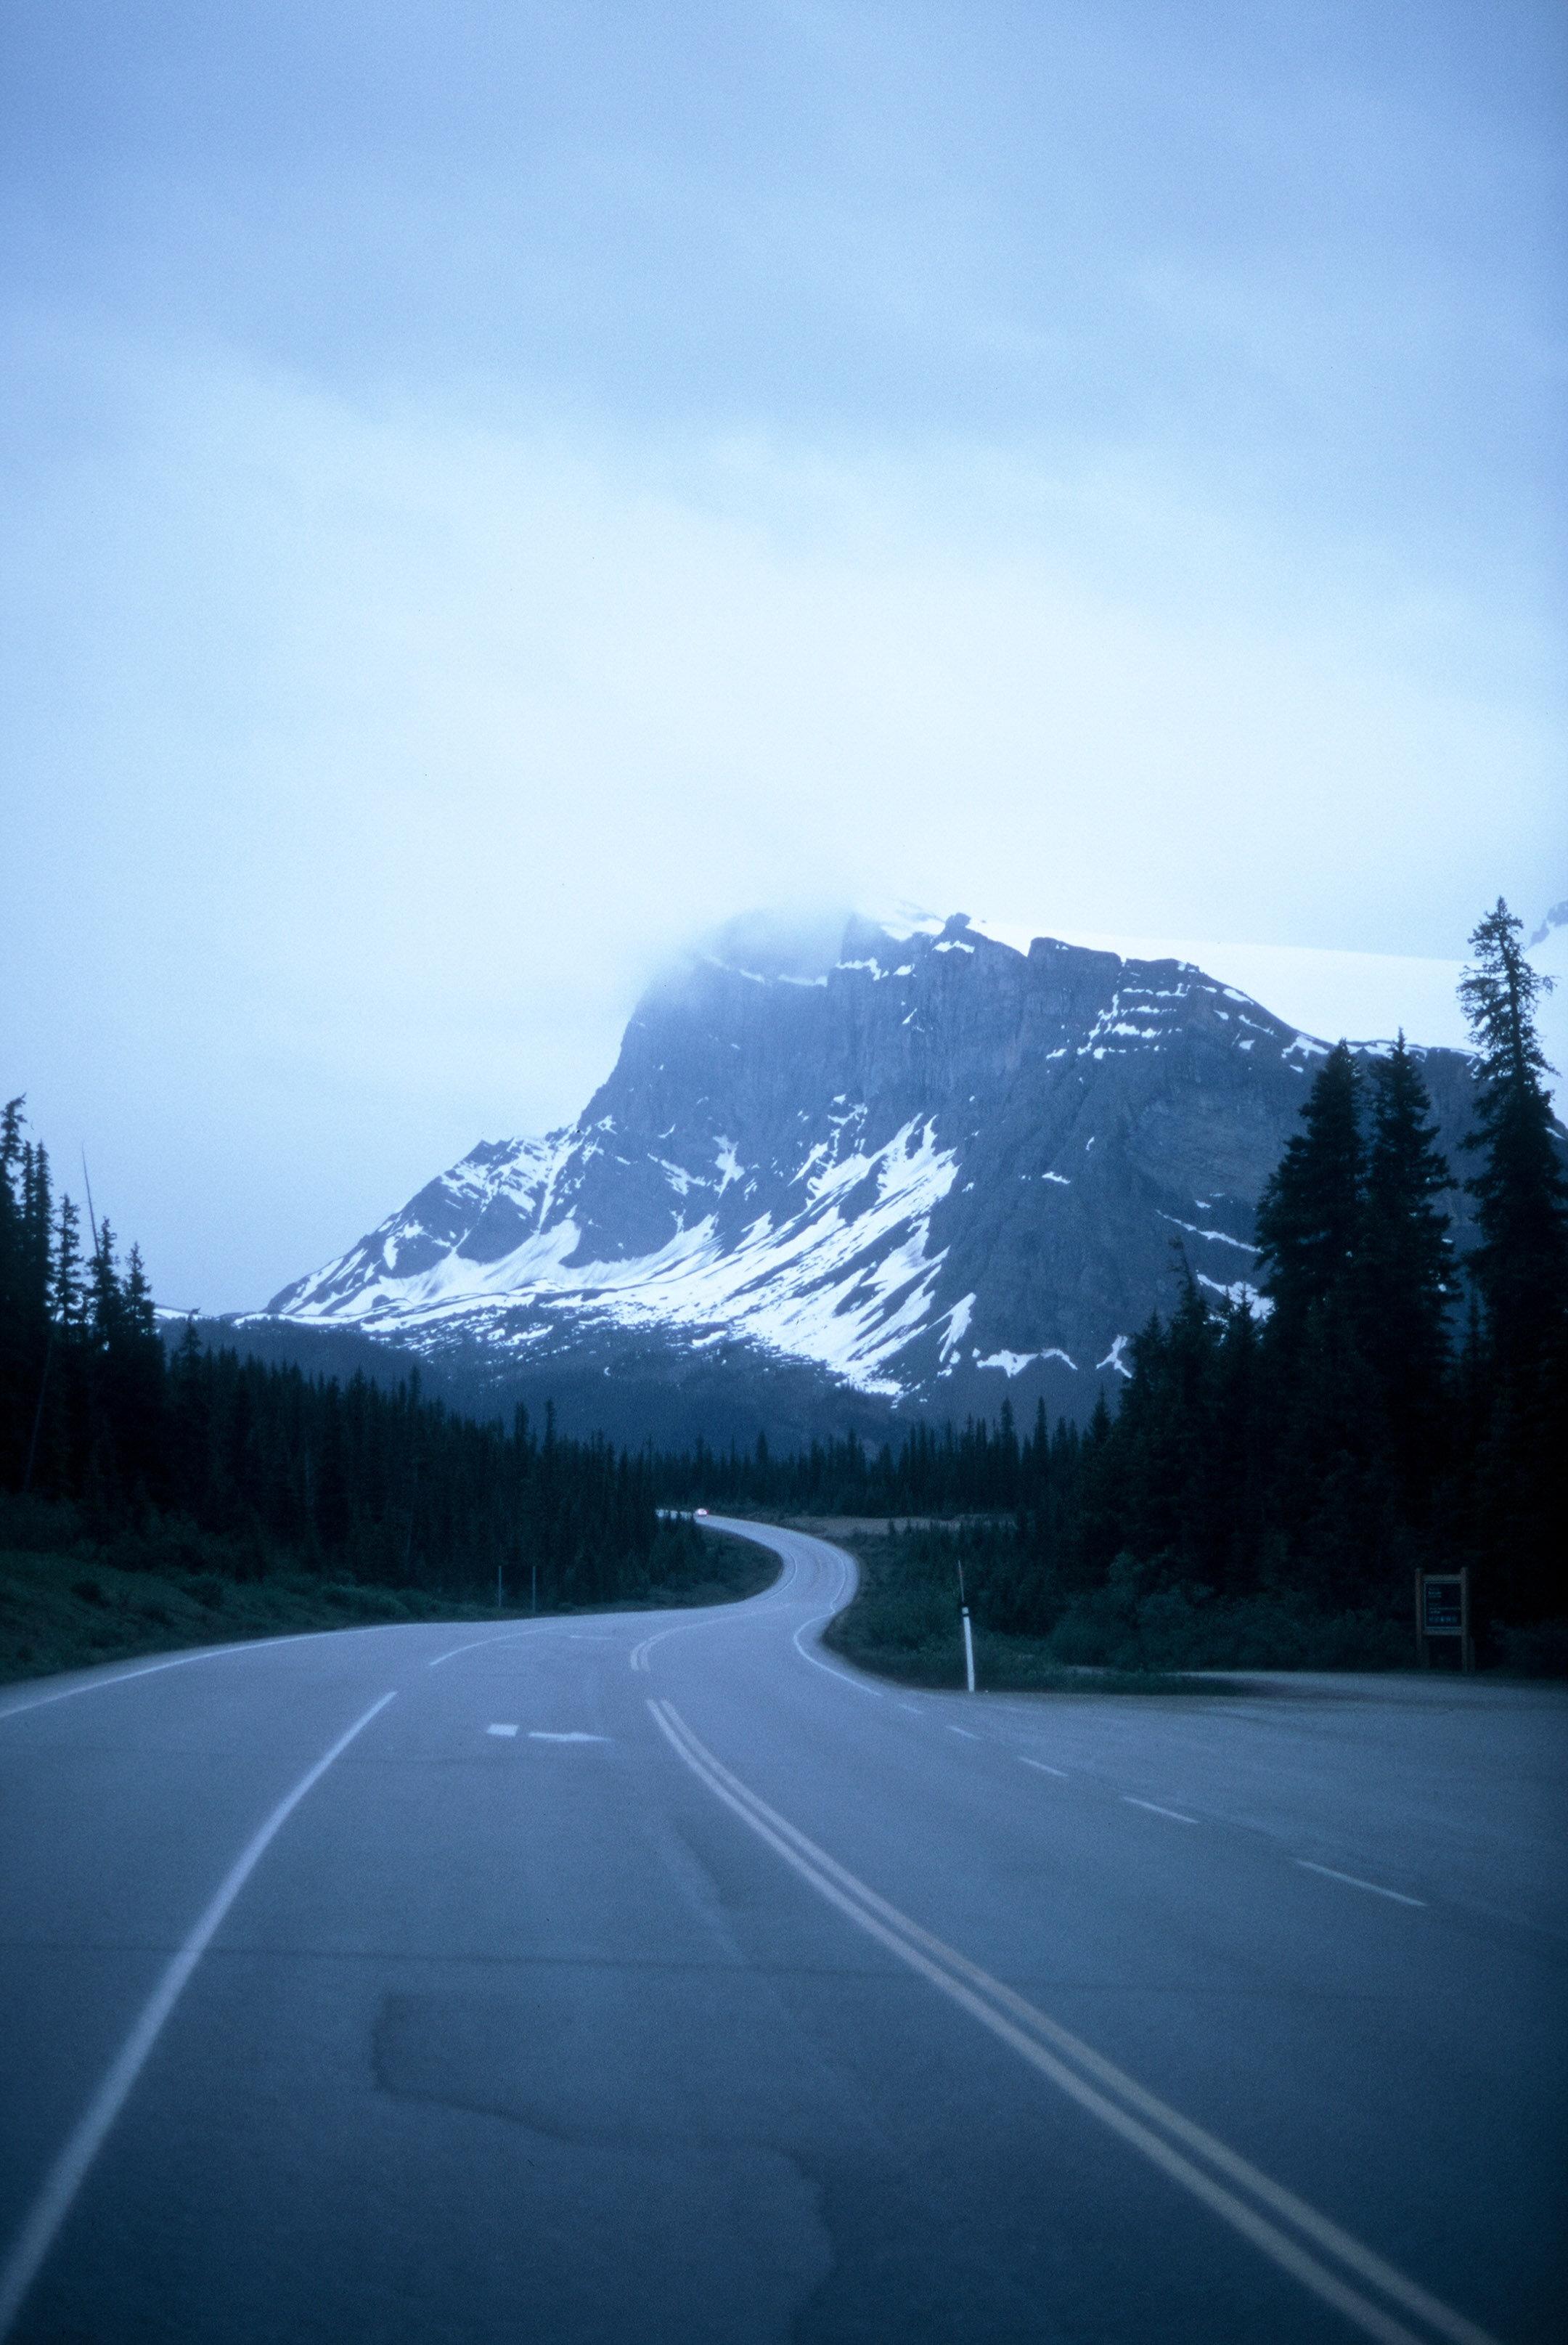 Canadian Rockies Banff Jasper Alberta Mountains 35mm SLR Canon A1 Sample Provia 100f Film Icefields Parkway